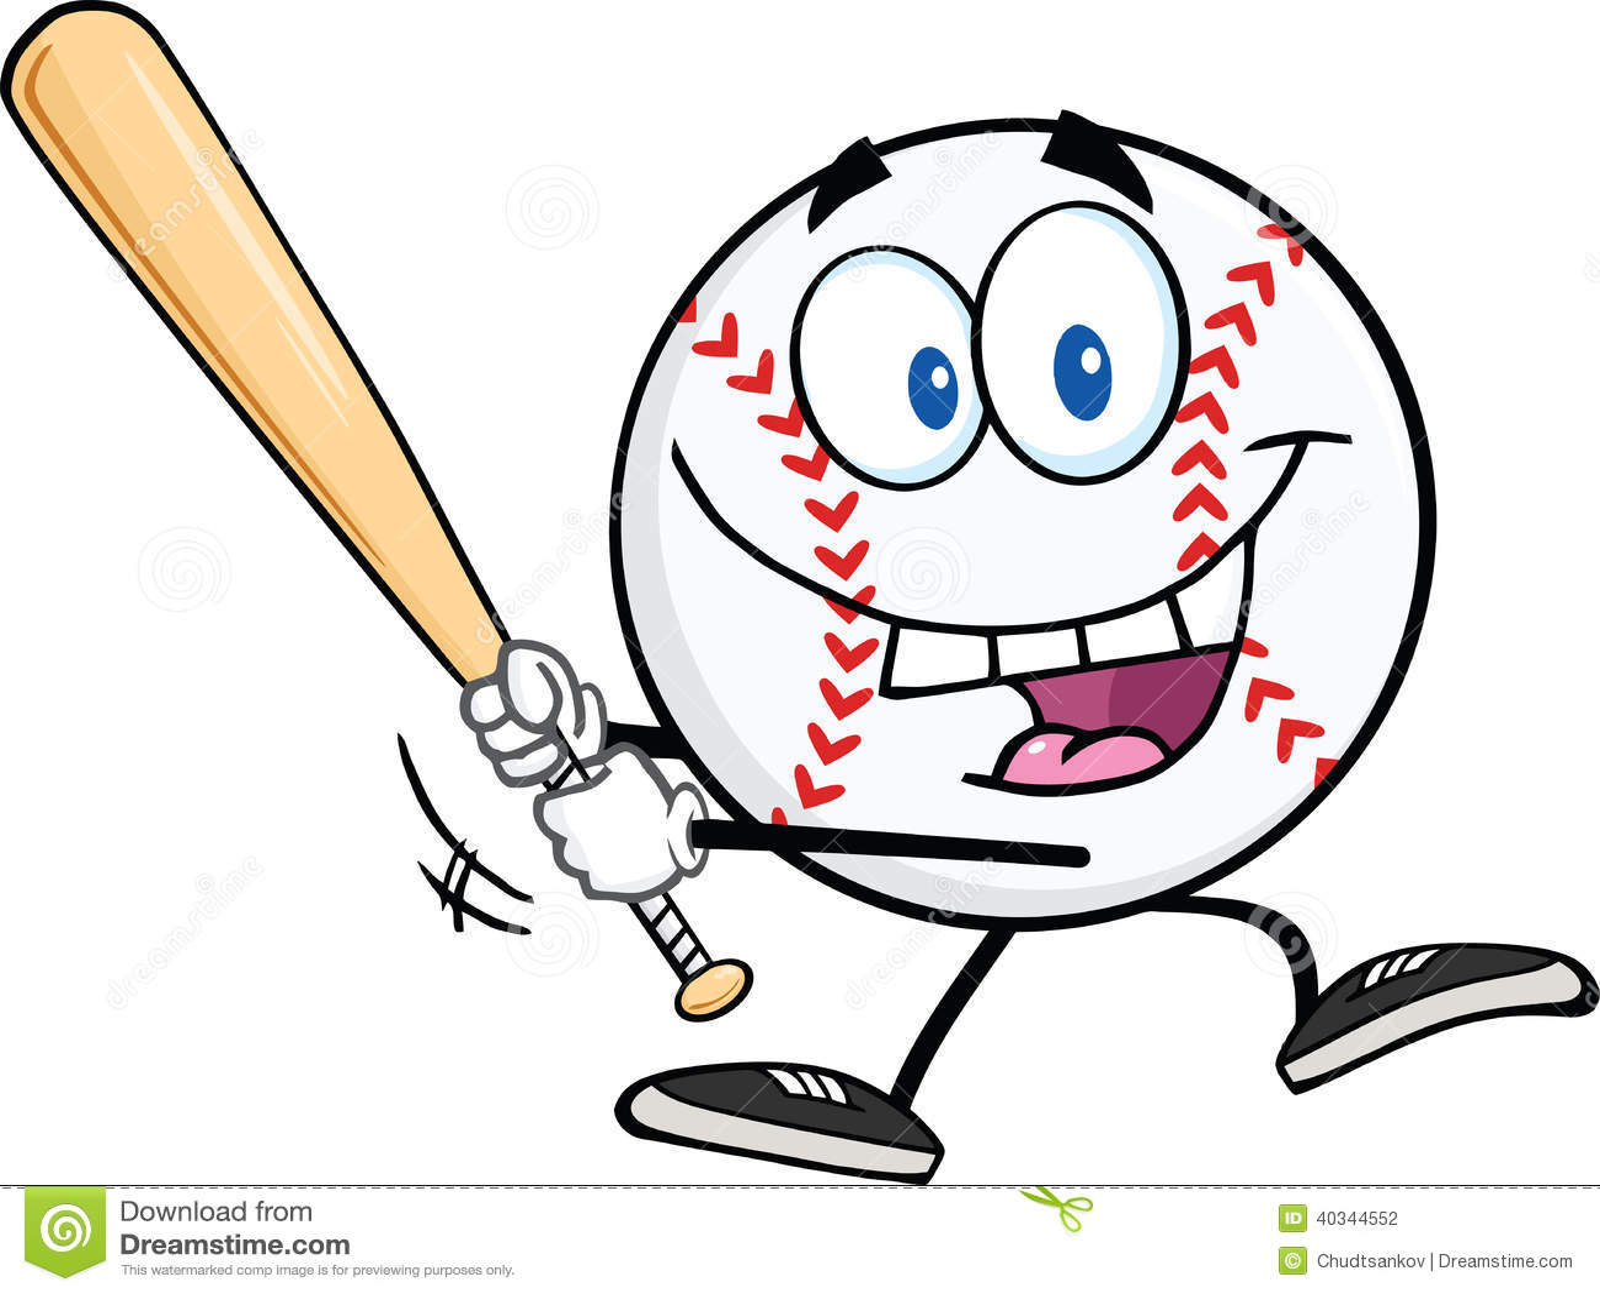 baseball ball and bat cartoon clip art stock vector illustration rh dreamstime com baseball bat hitting ball clipart baseball player hitting ball clipart